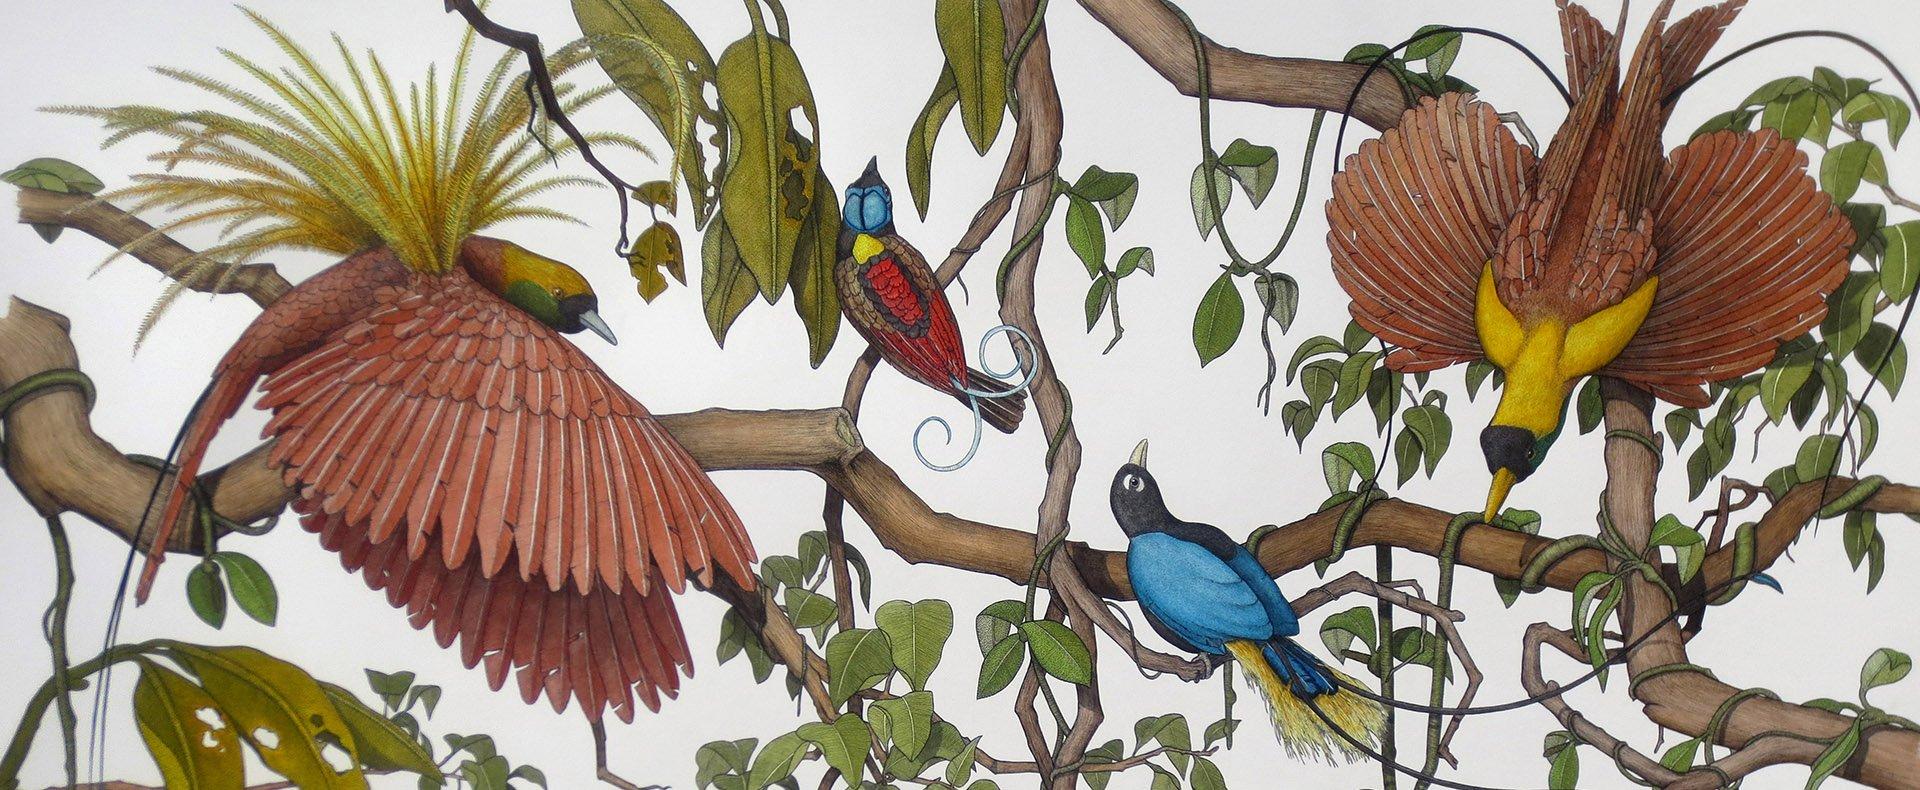 Scientific Illustration Workshops: Birds & Bones